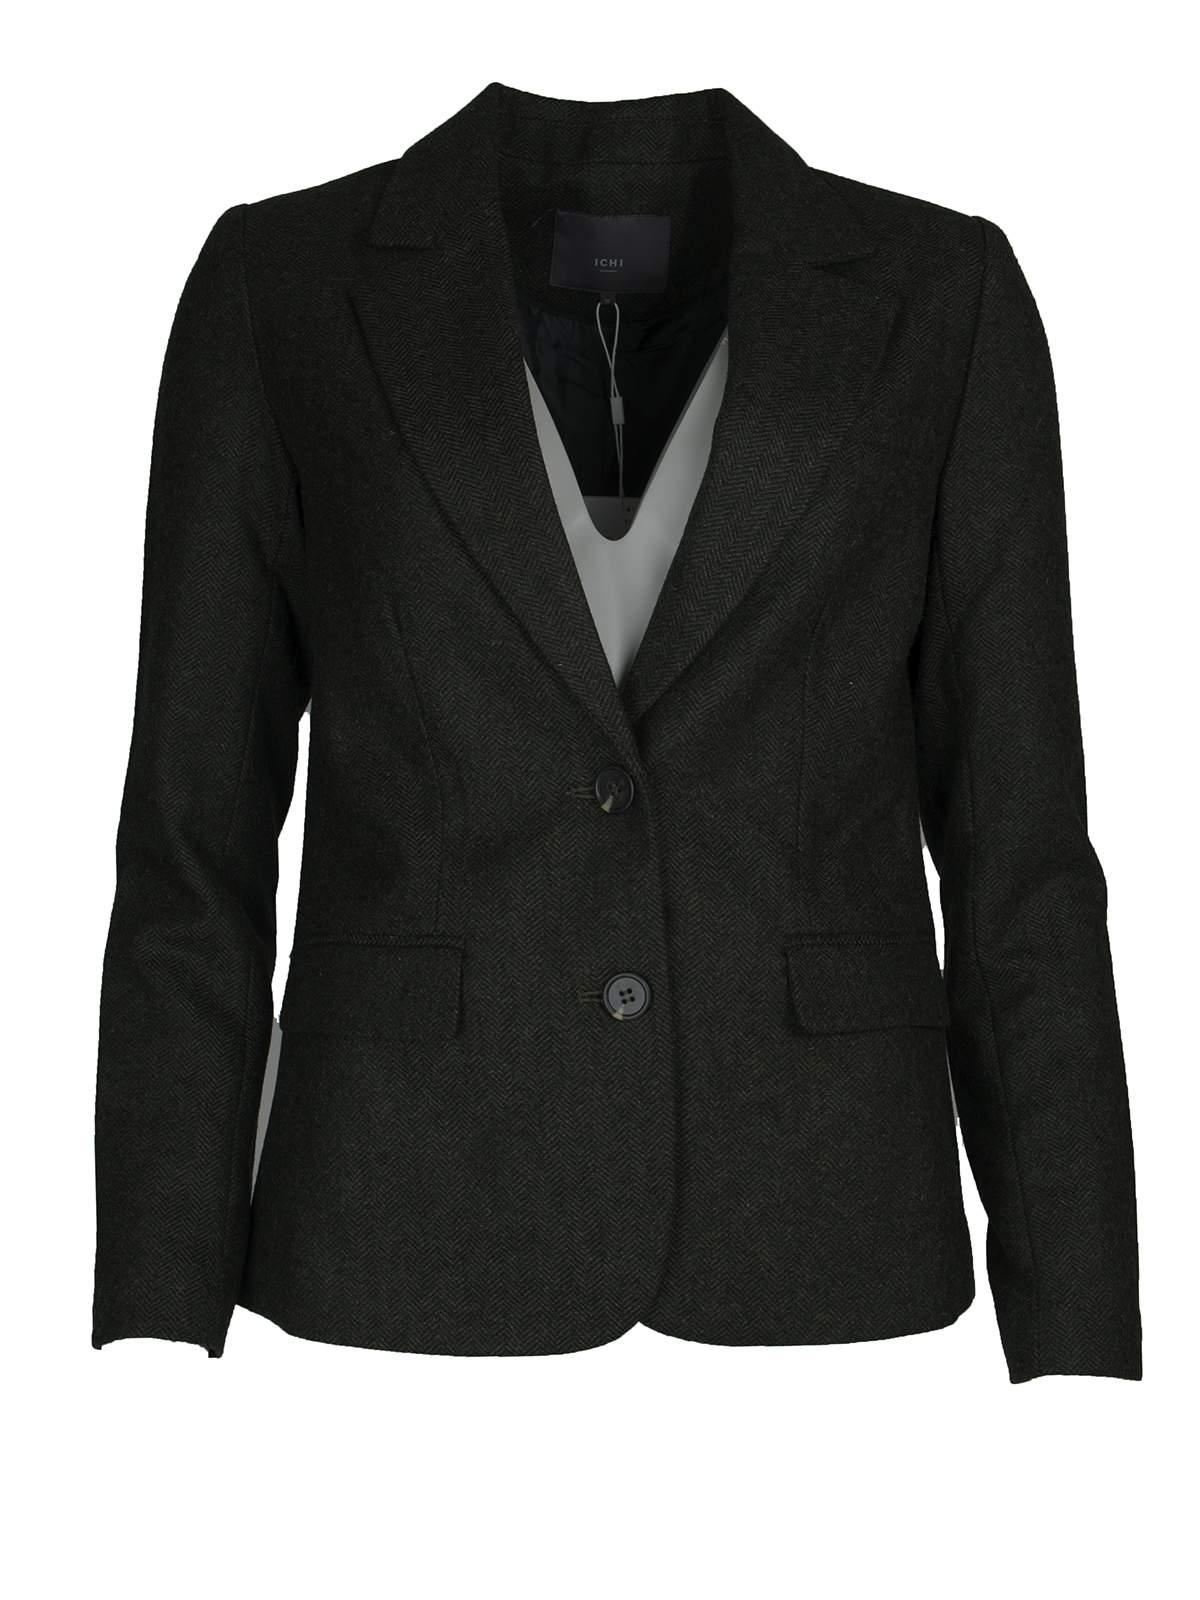 f27fe3164c2b00 Dinizo Blouse - Katie Kerr - Women's Clothing - UK